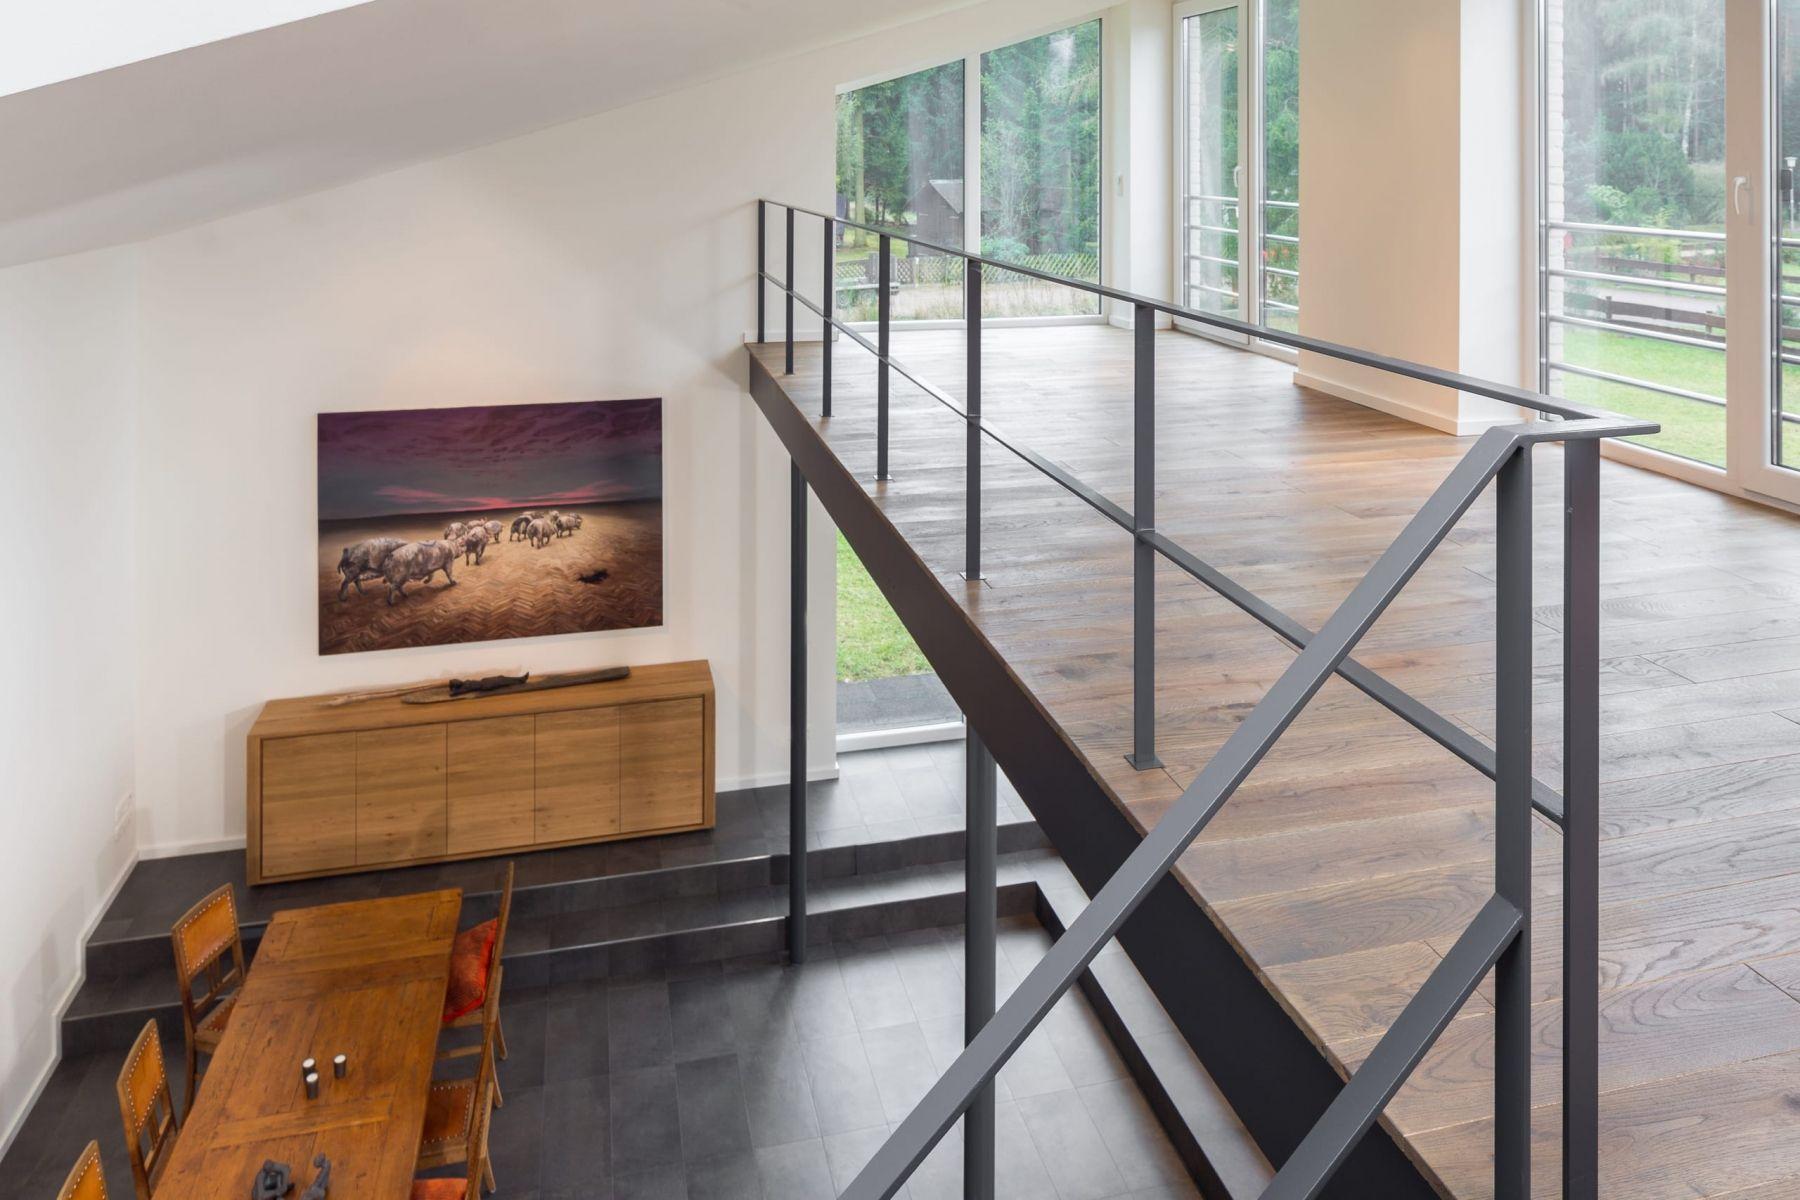 hpl treppen hpl treppe 01 treppenbau vo treppe deckenverkleidung und stahlwangentreppe. Black Bedroom Furniture Sets. Home Design Ideas